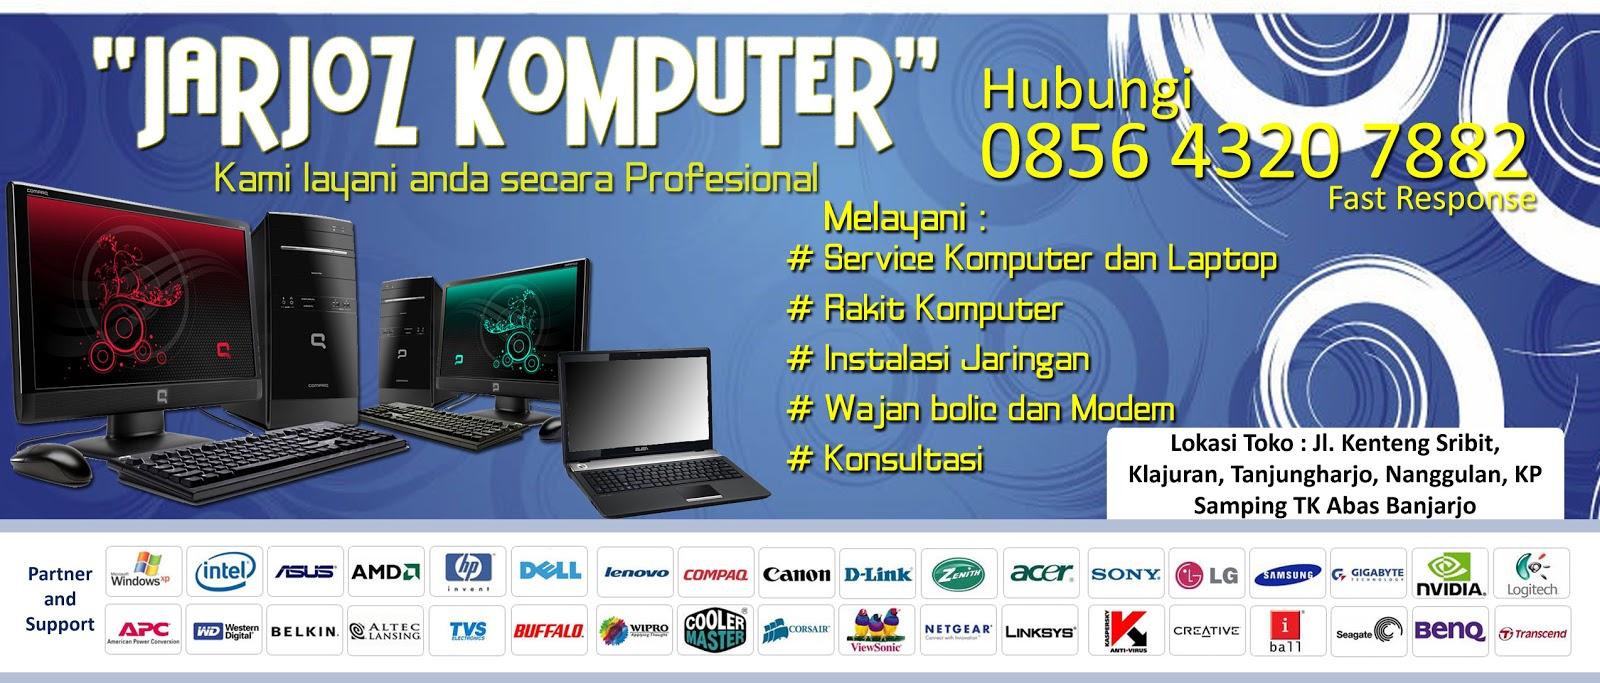 Contoh Banner/Spanduk toko komputer - Didit Blog ...